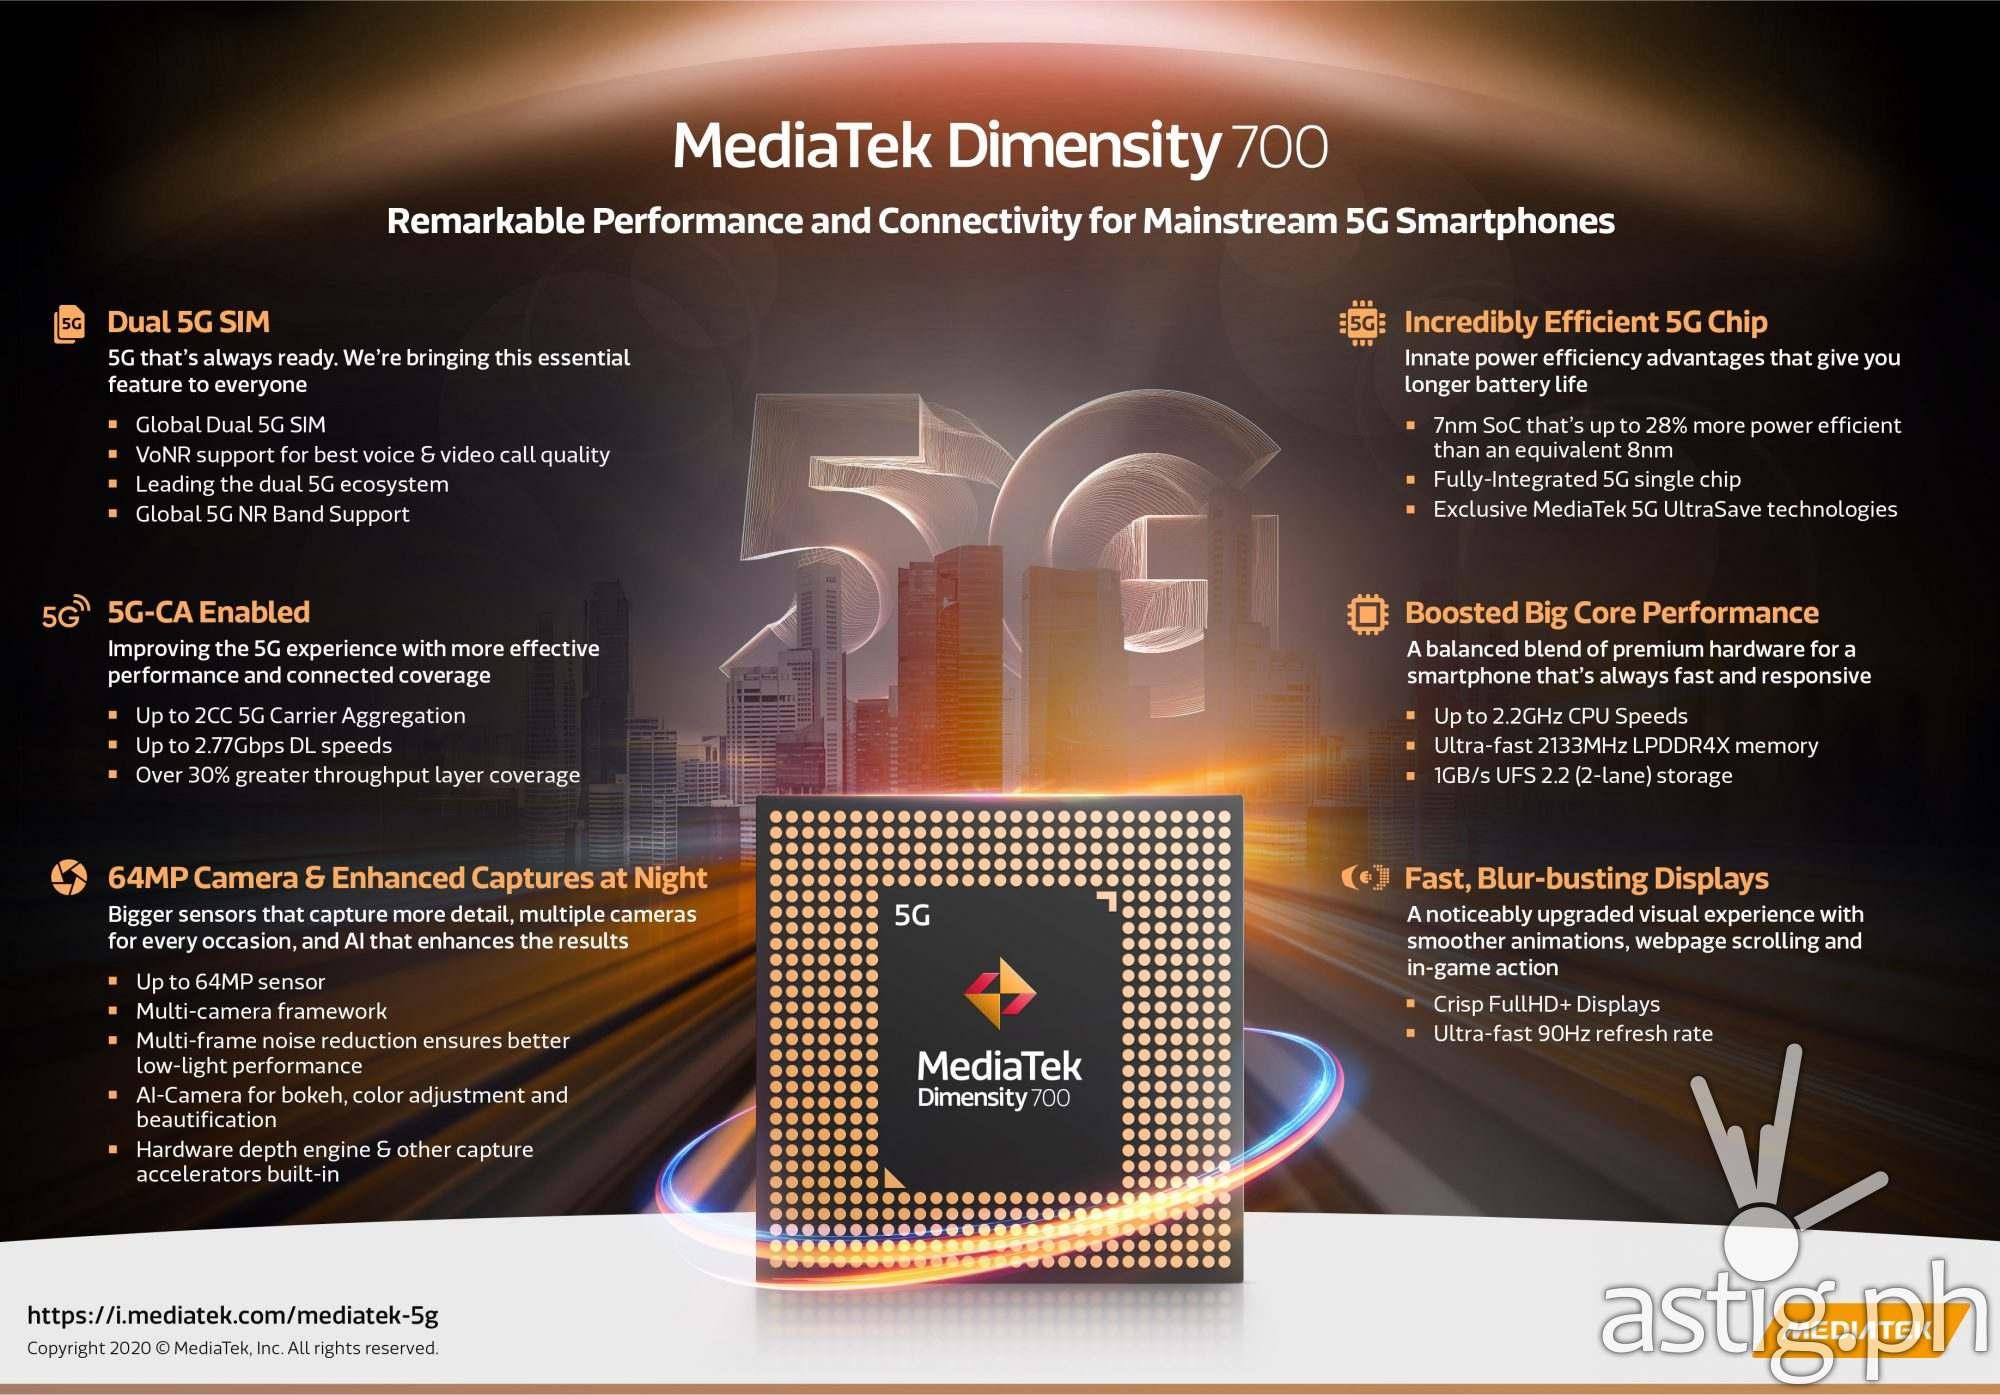 MediaTek Dimensity 700 Infographic